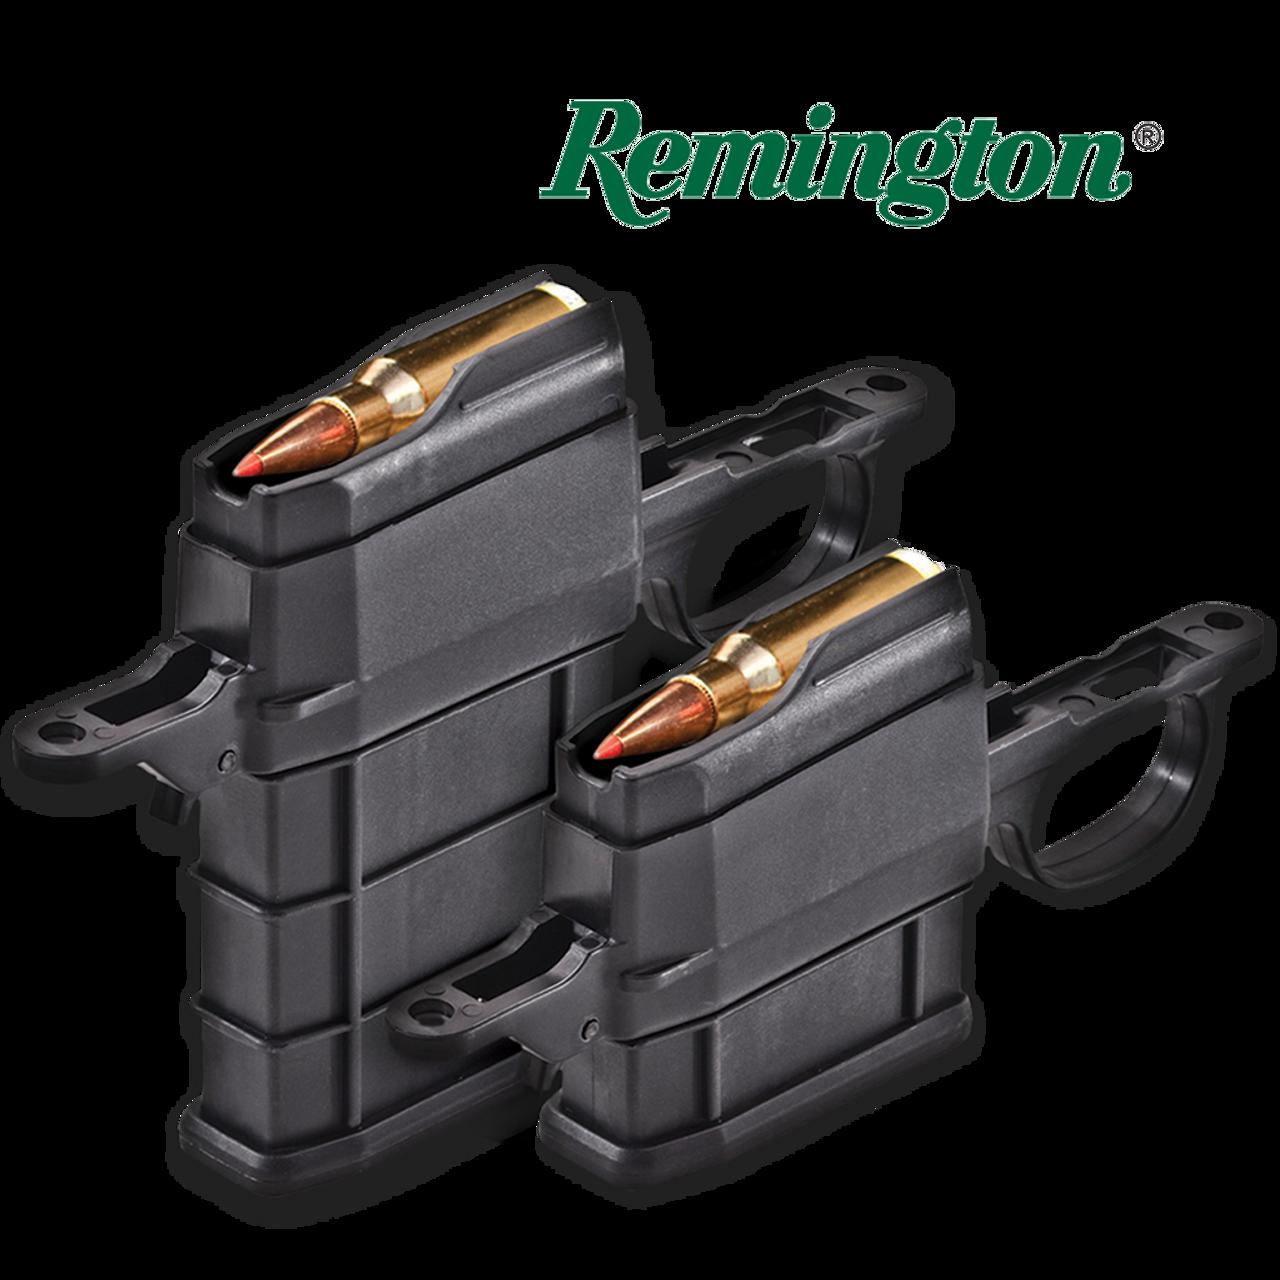 Legacy Sports Remington 700 Detachable Magazine Kit 6.5 Creedmoor - 5 rd